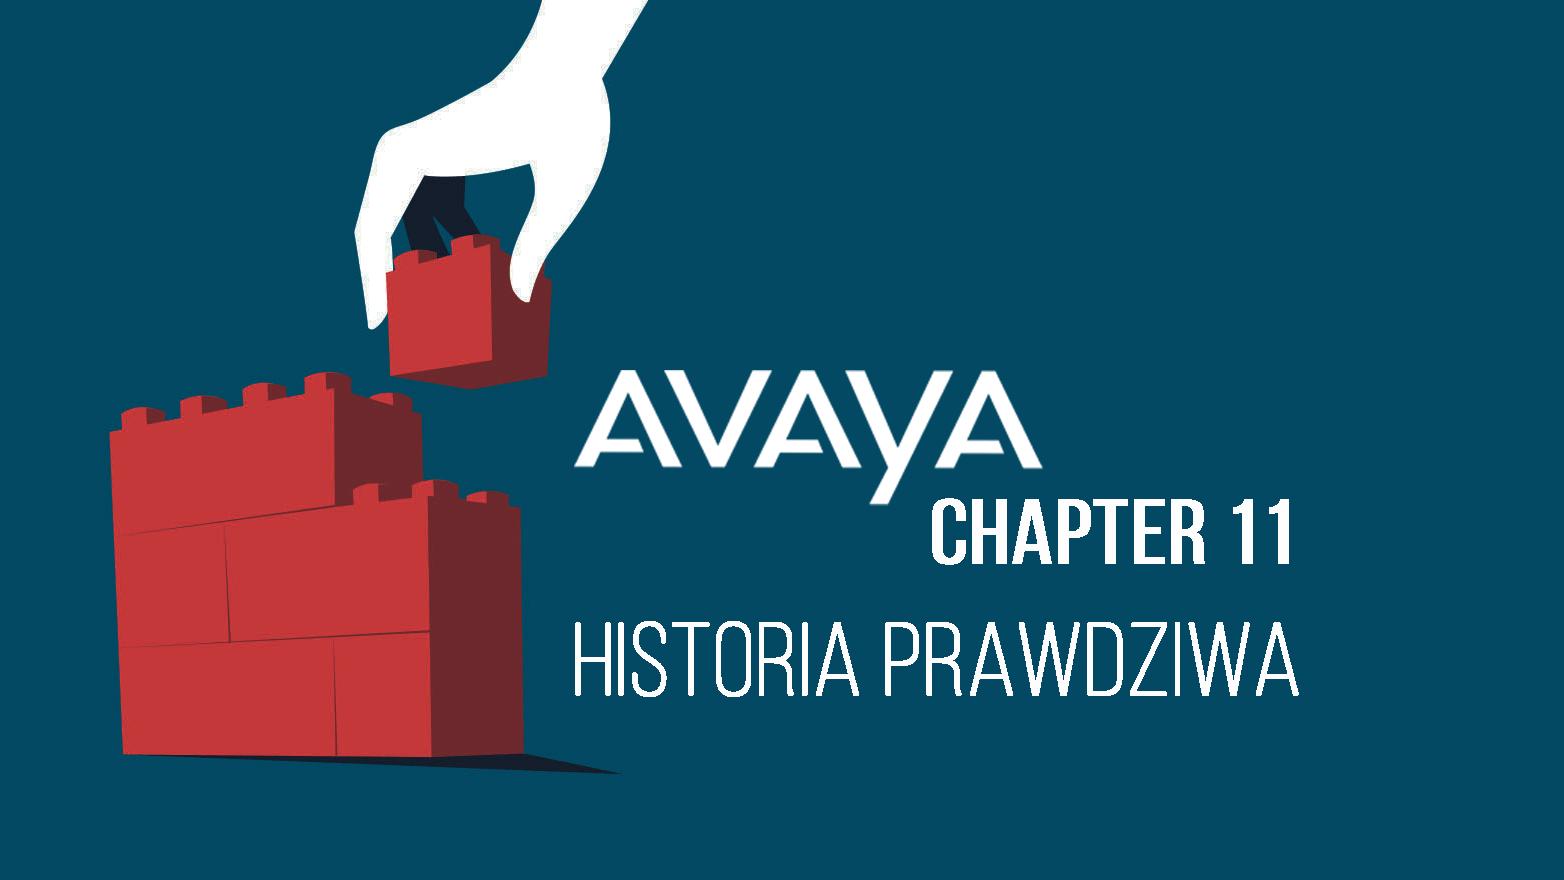 Avaya chapter 11 historia prawdziwa